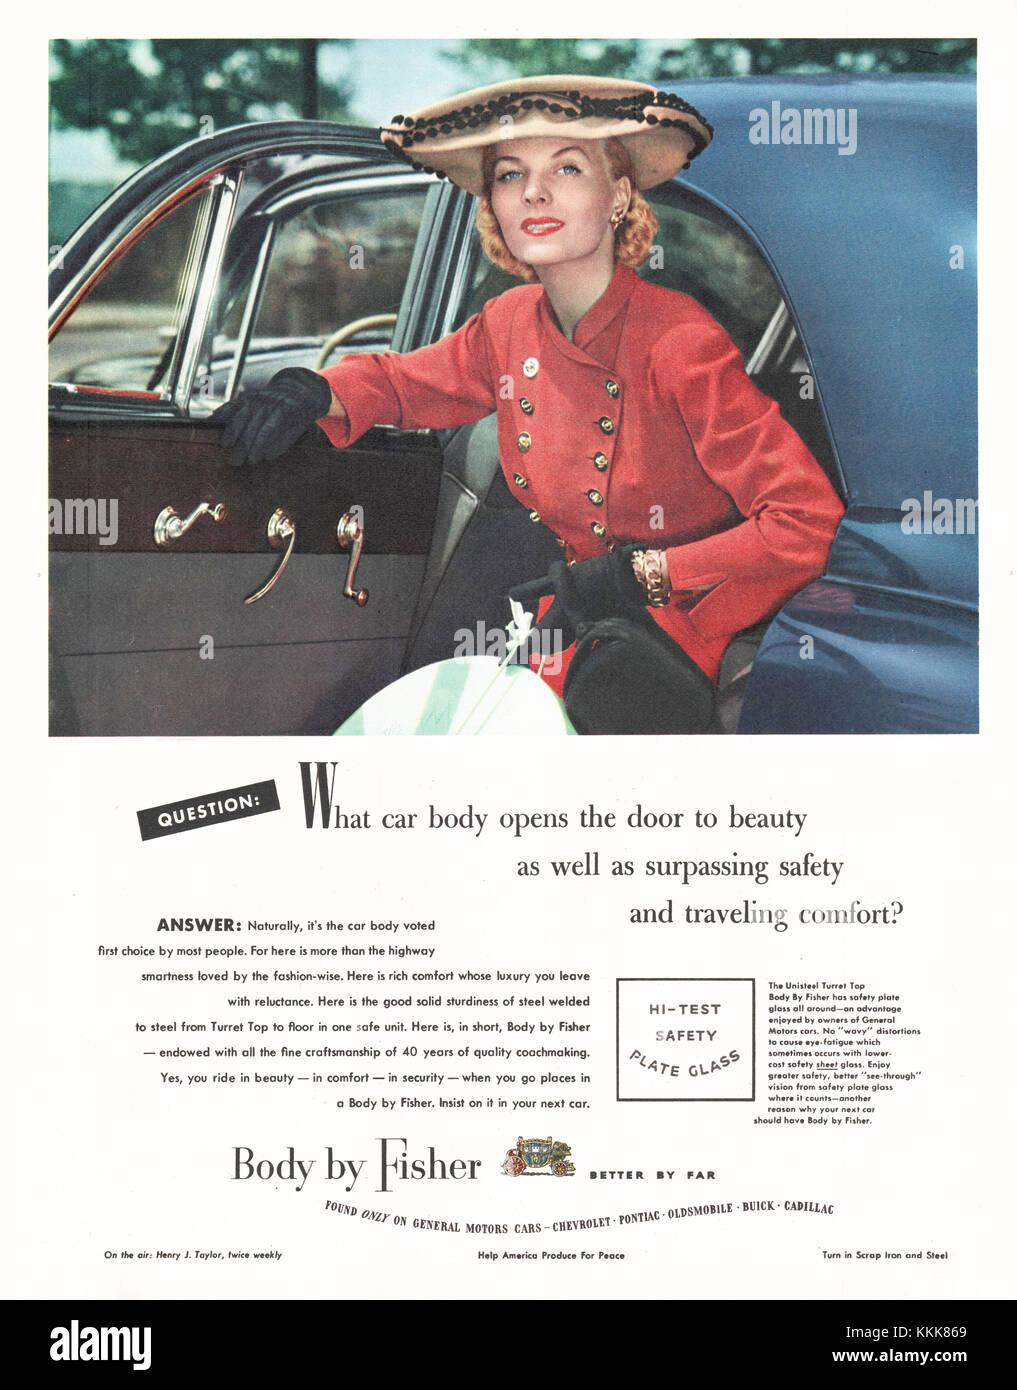 1948 U.S. Magazine Fisher Car Body Advert Stock Photo, Royalty ...